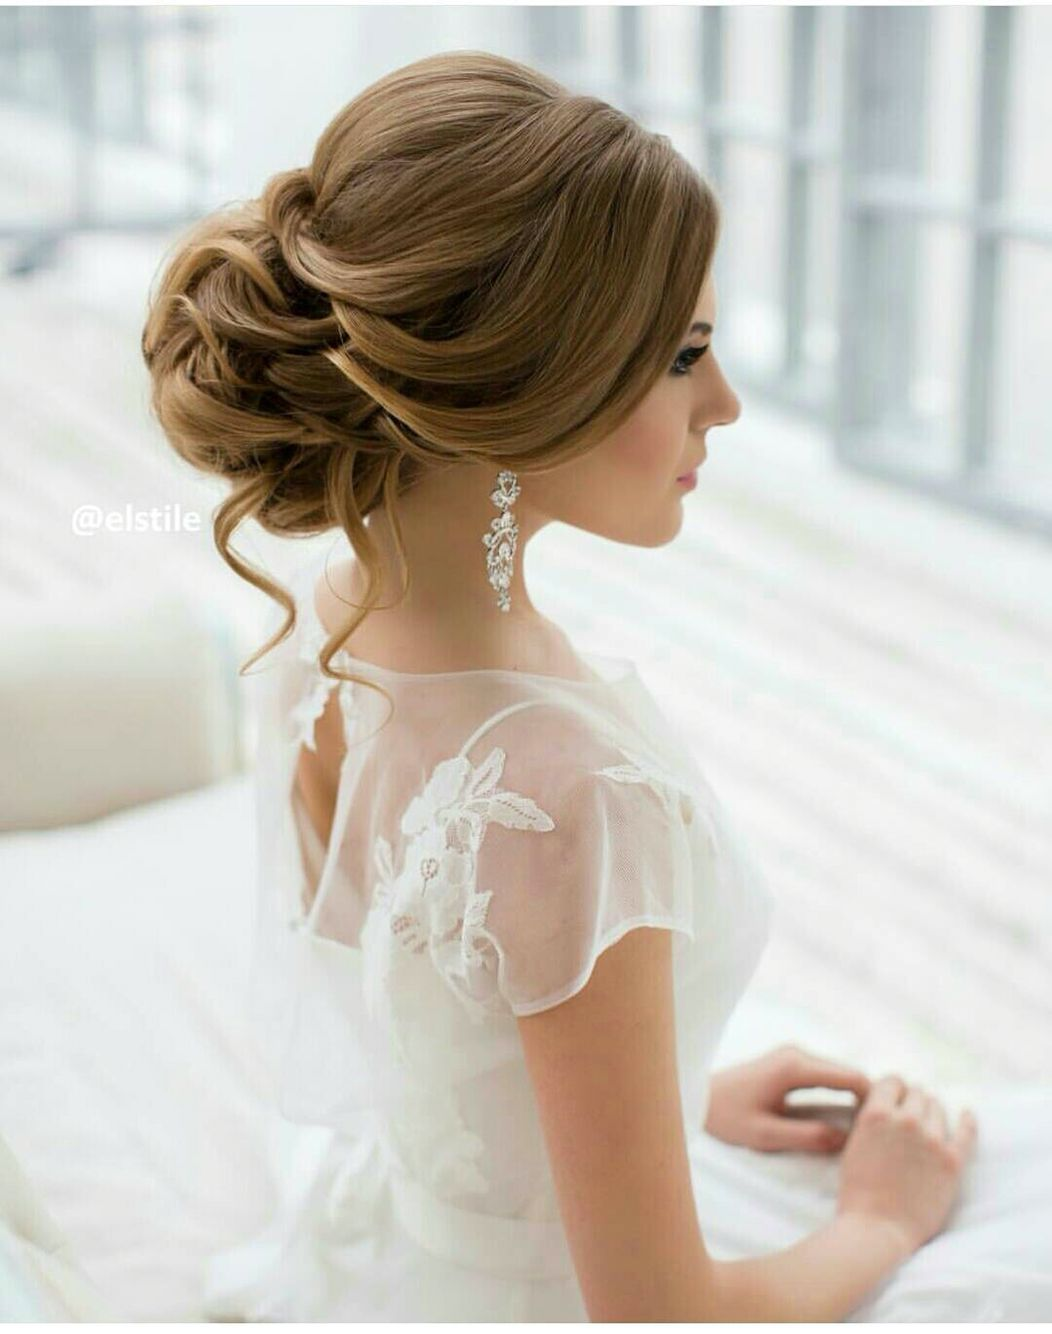 Pin by Alison Ana on Hair Styles | Pinterest | Hair wedding, Wedding ...